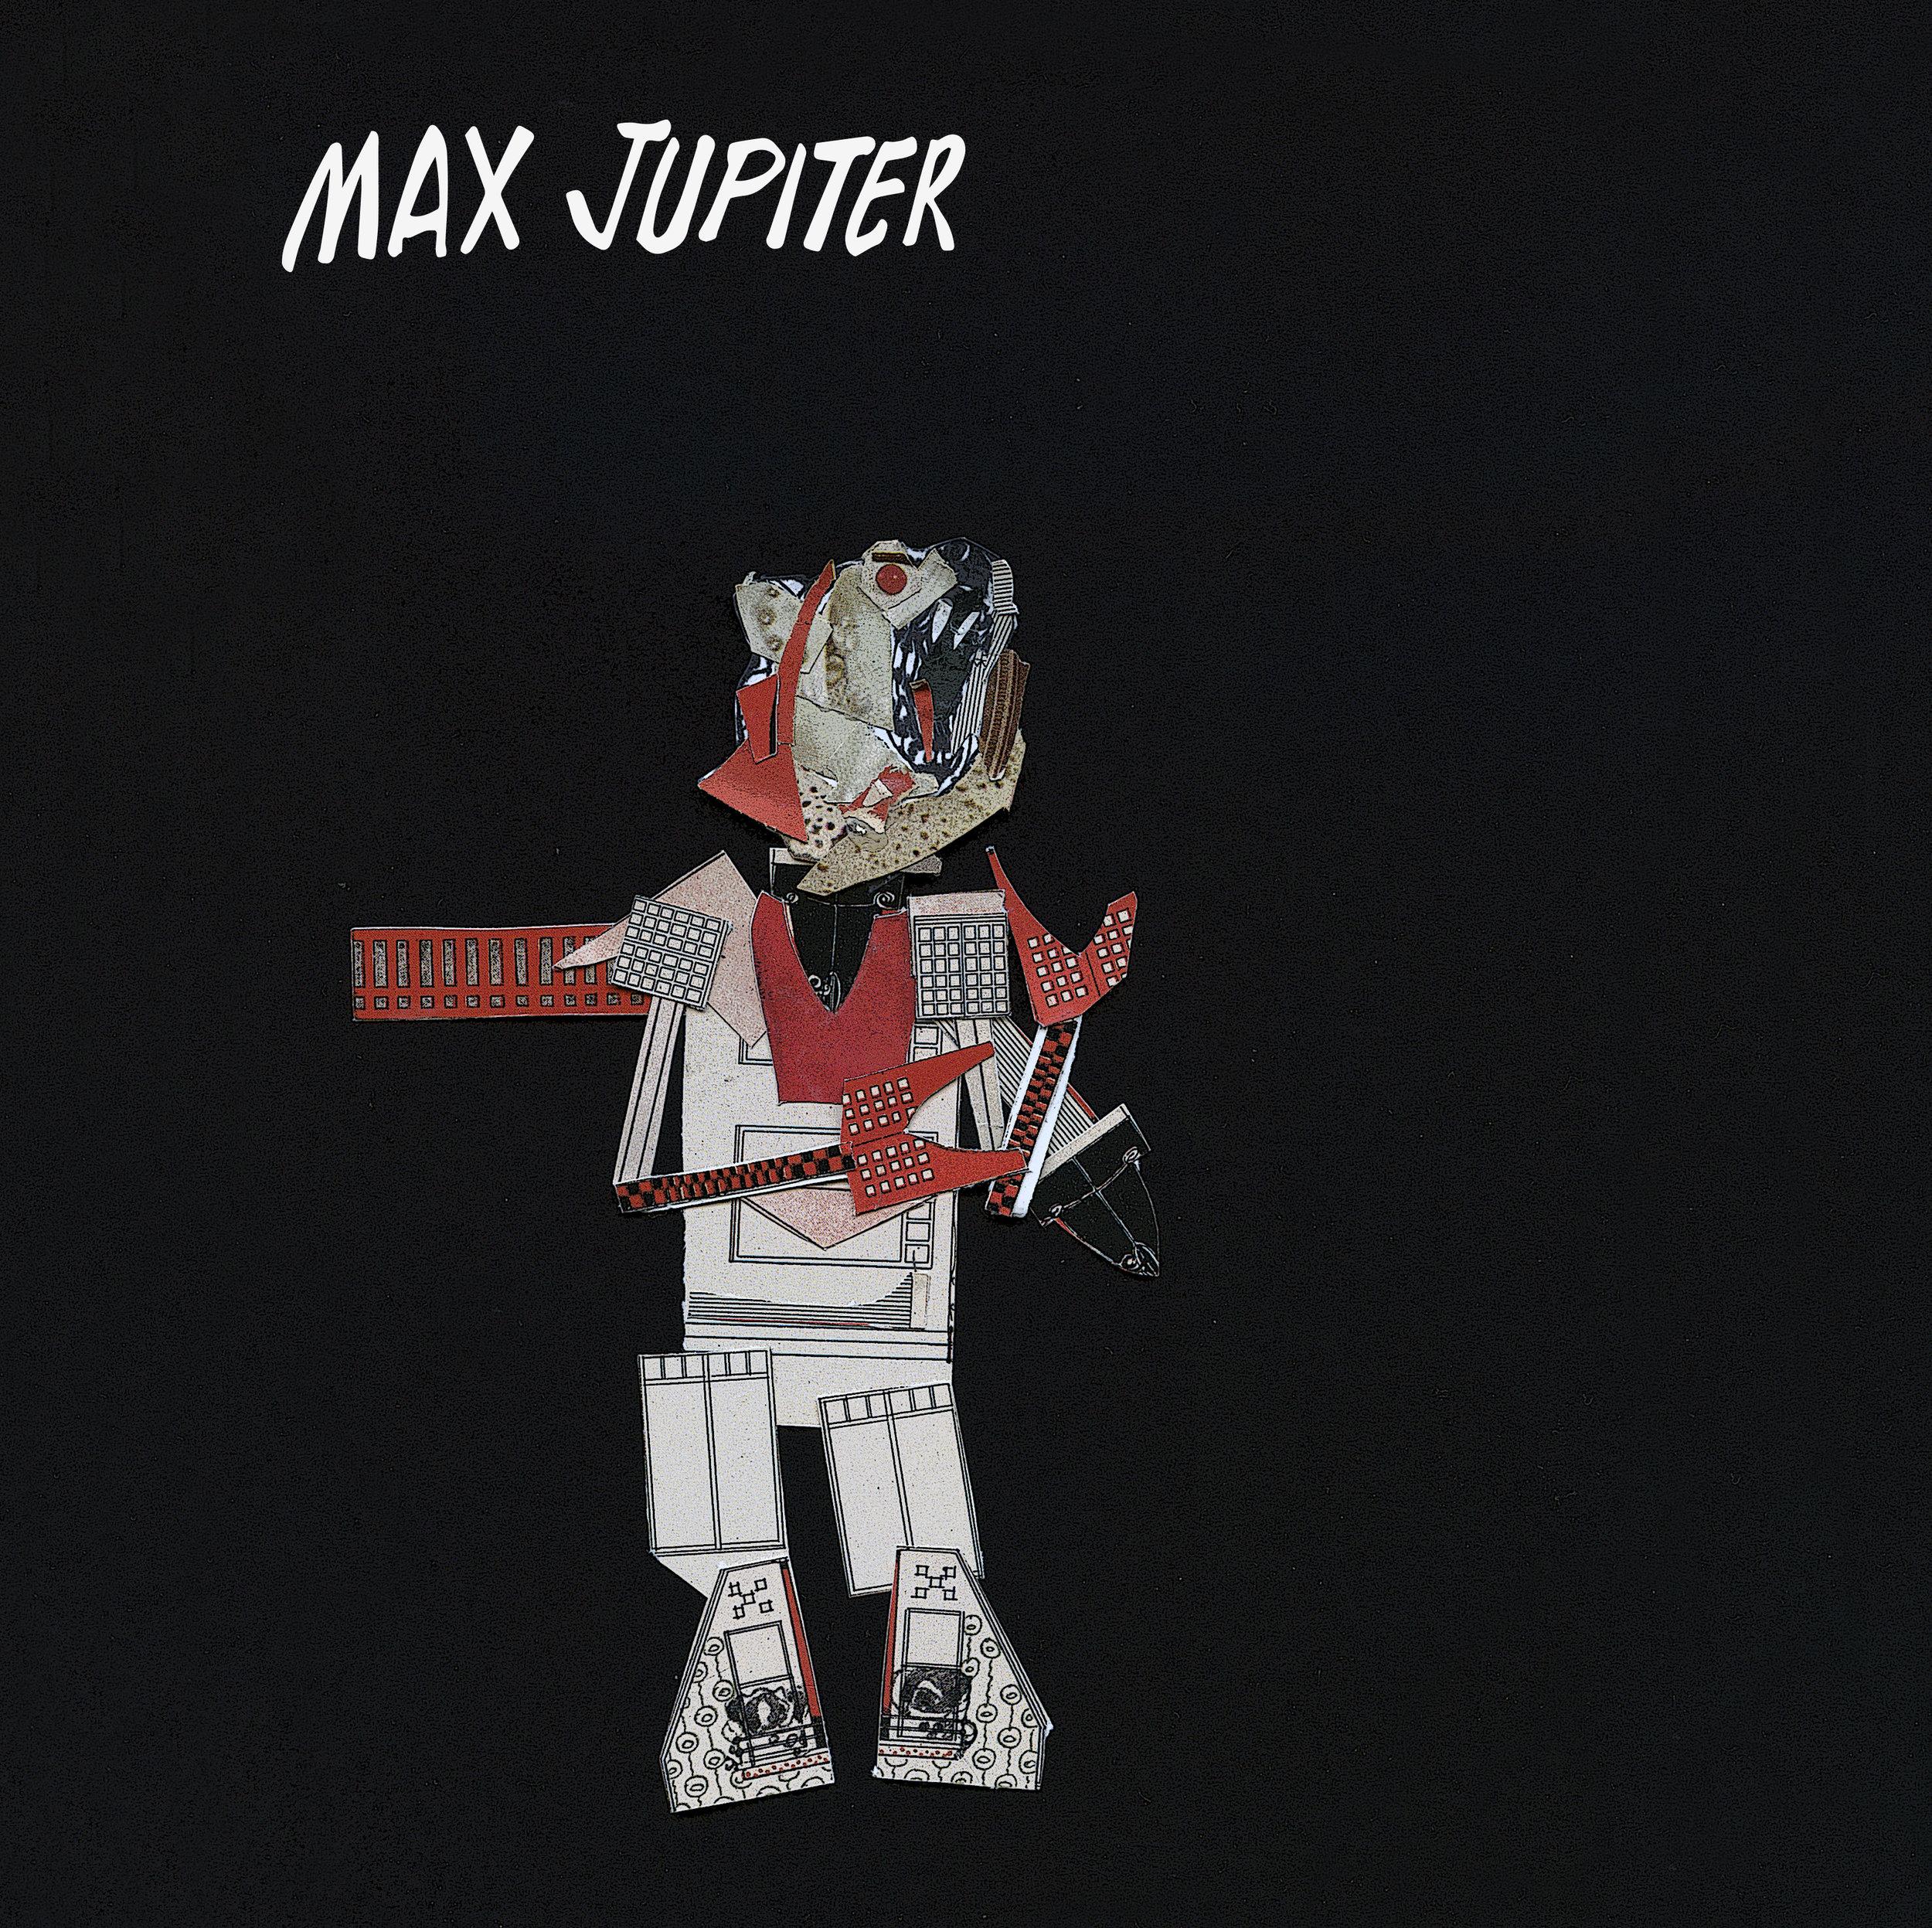 Wildman_maxjupiter3.jpg